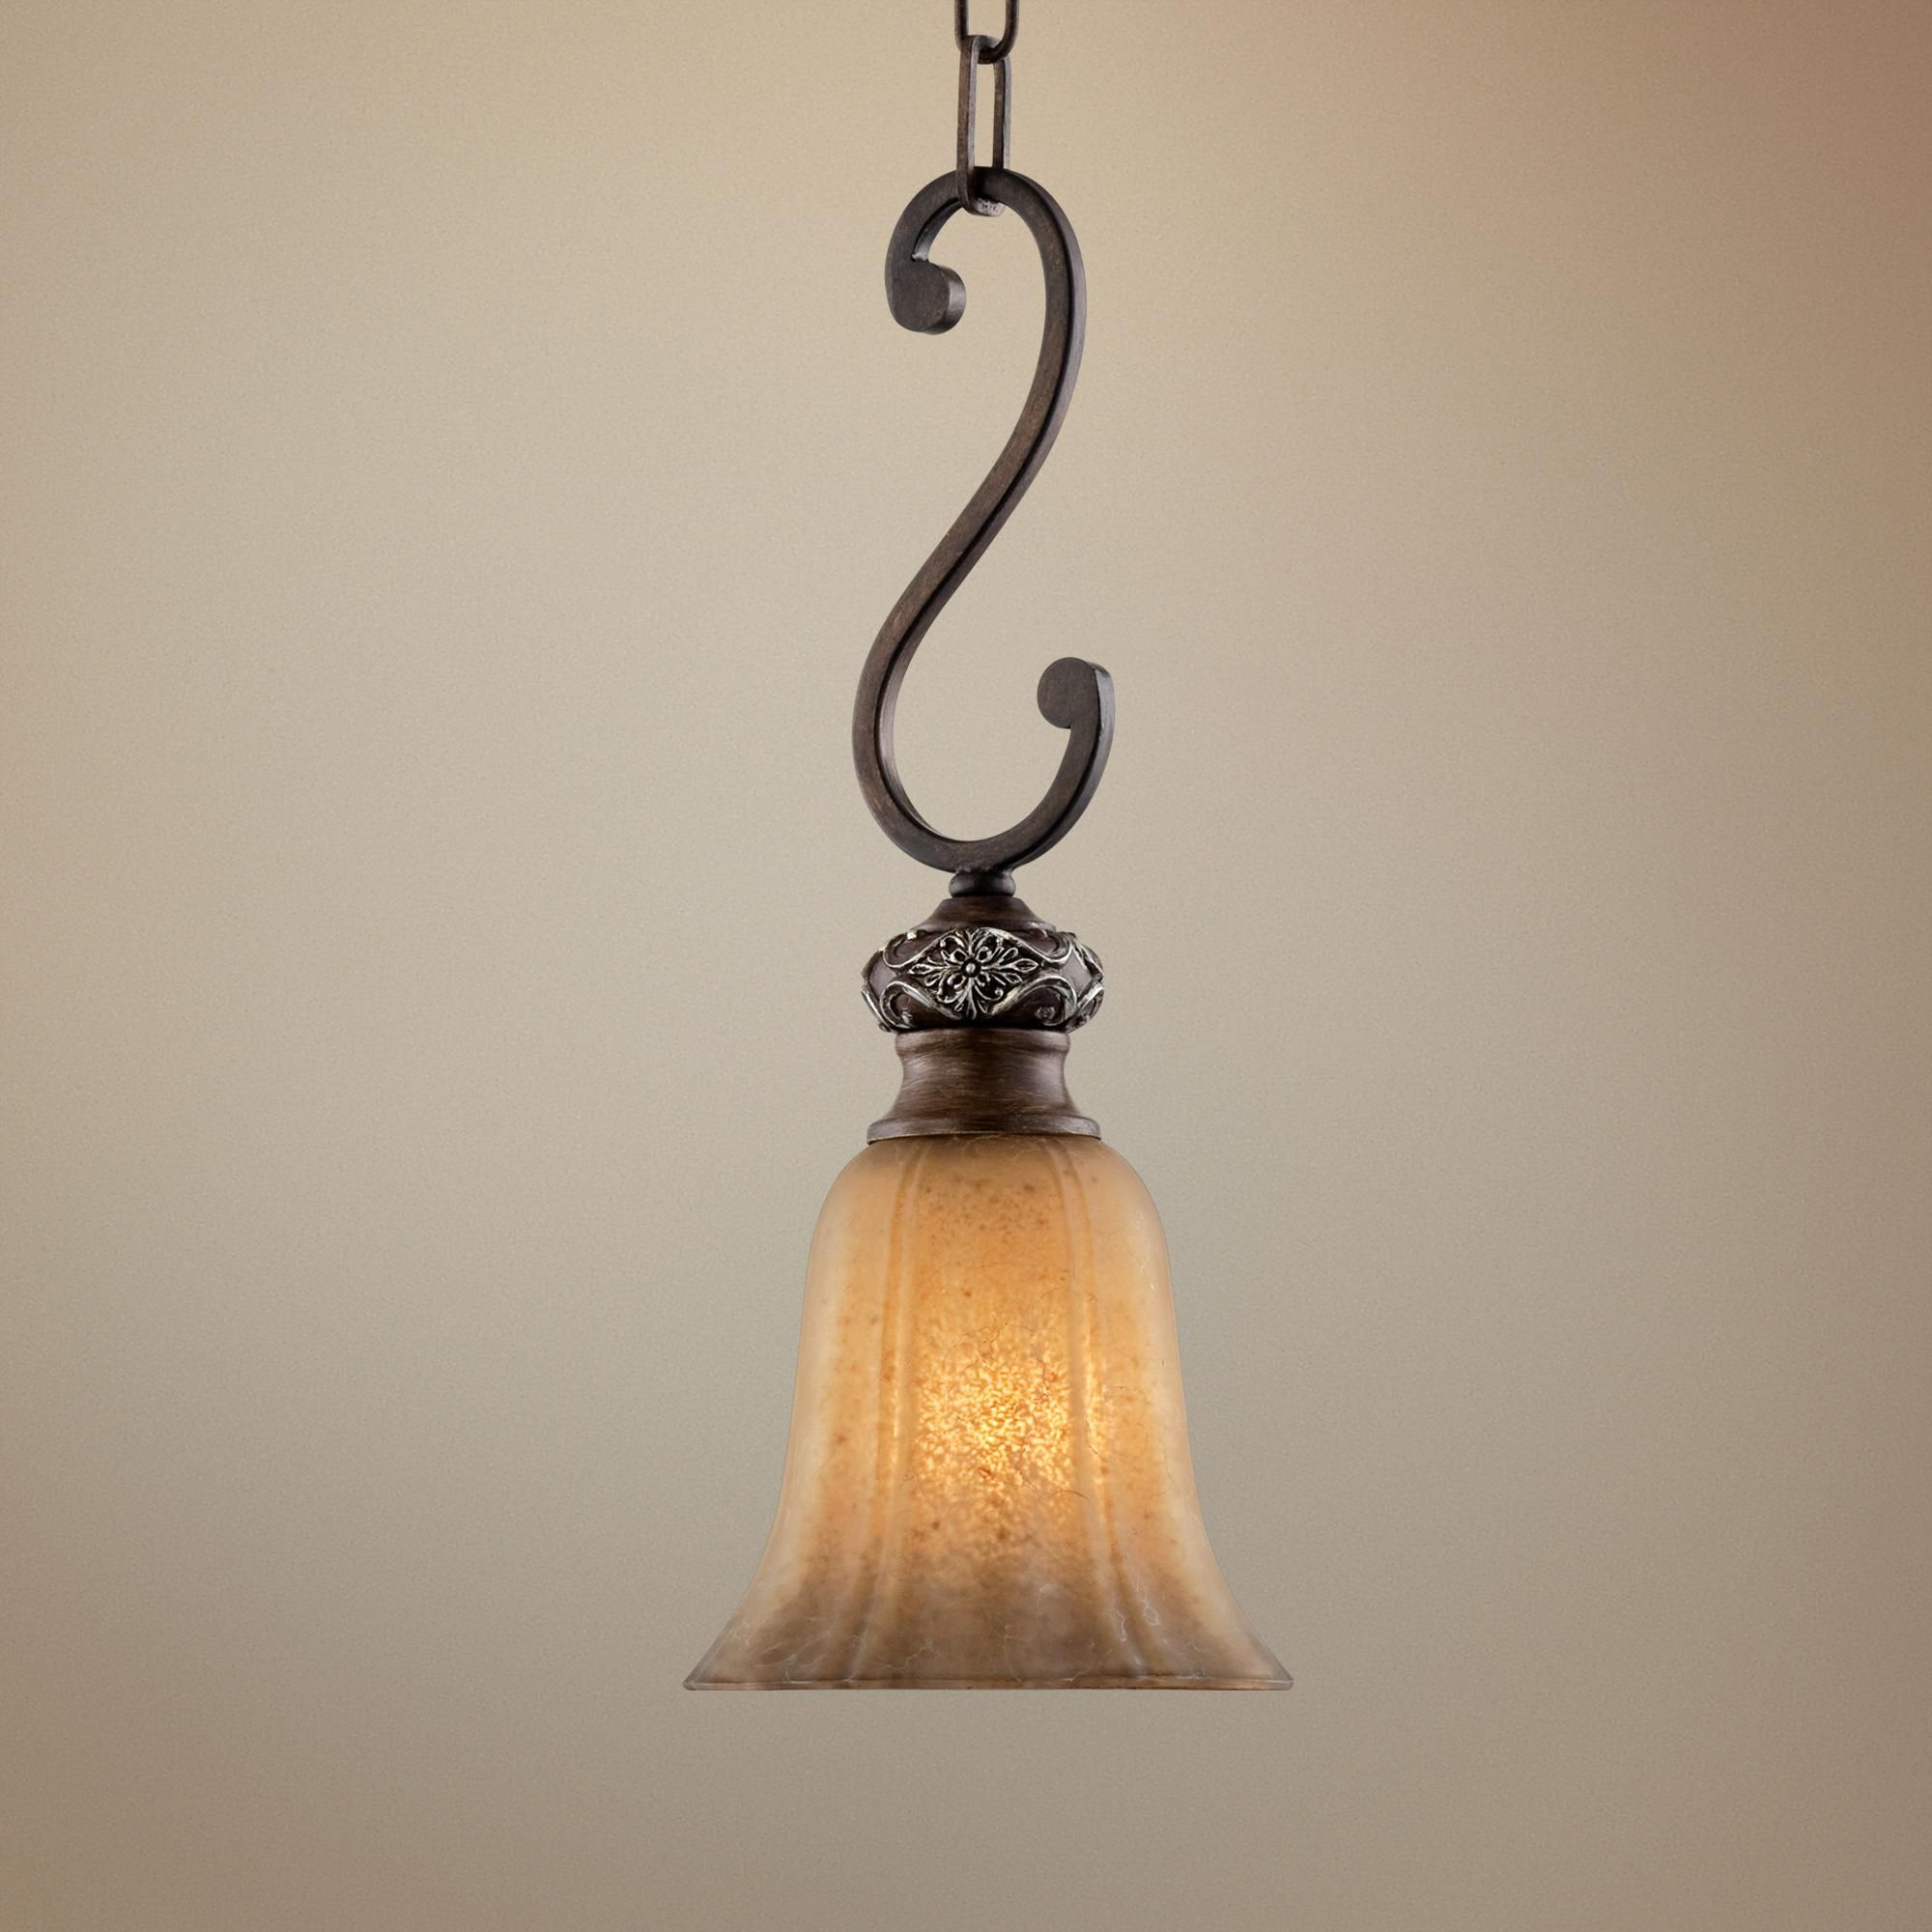 Kathy Ireland Sterling Estate Mini Pendant Light R4856